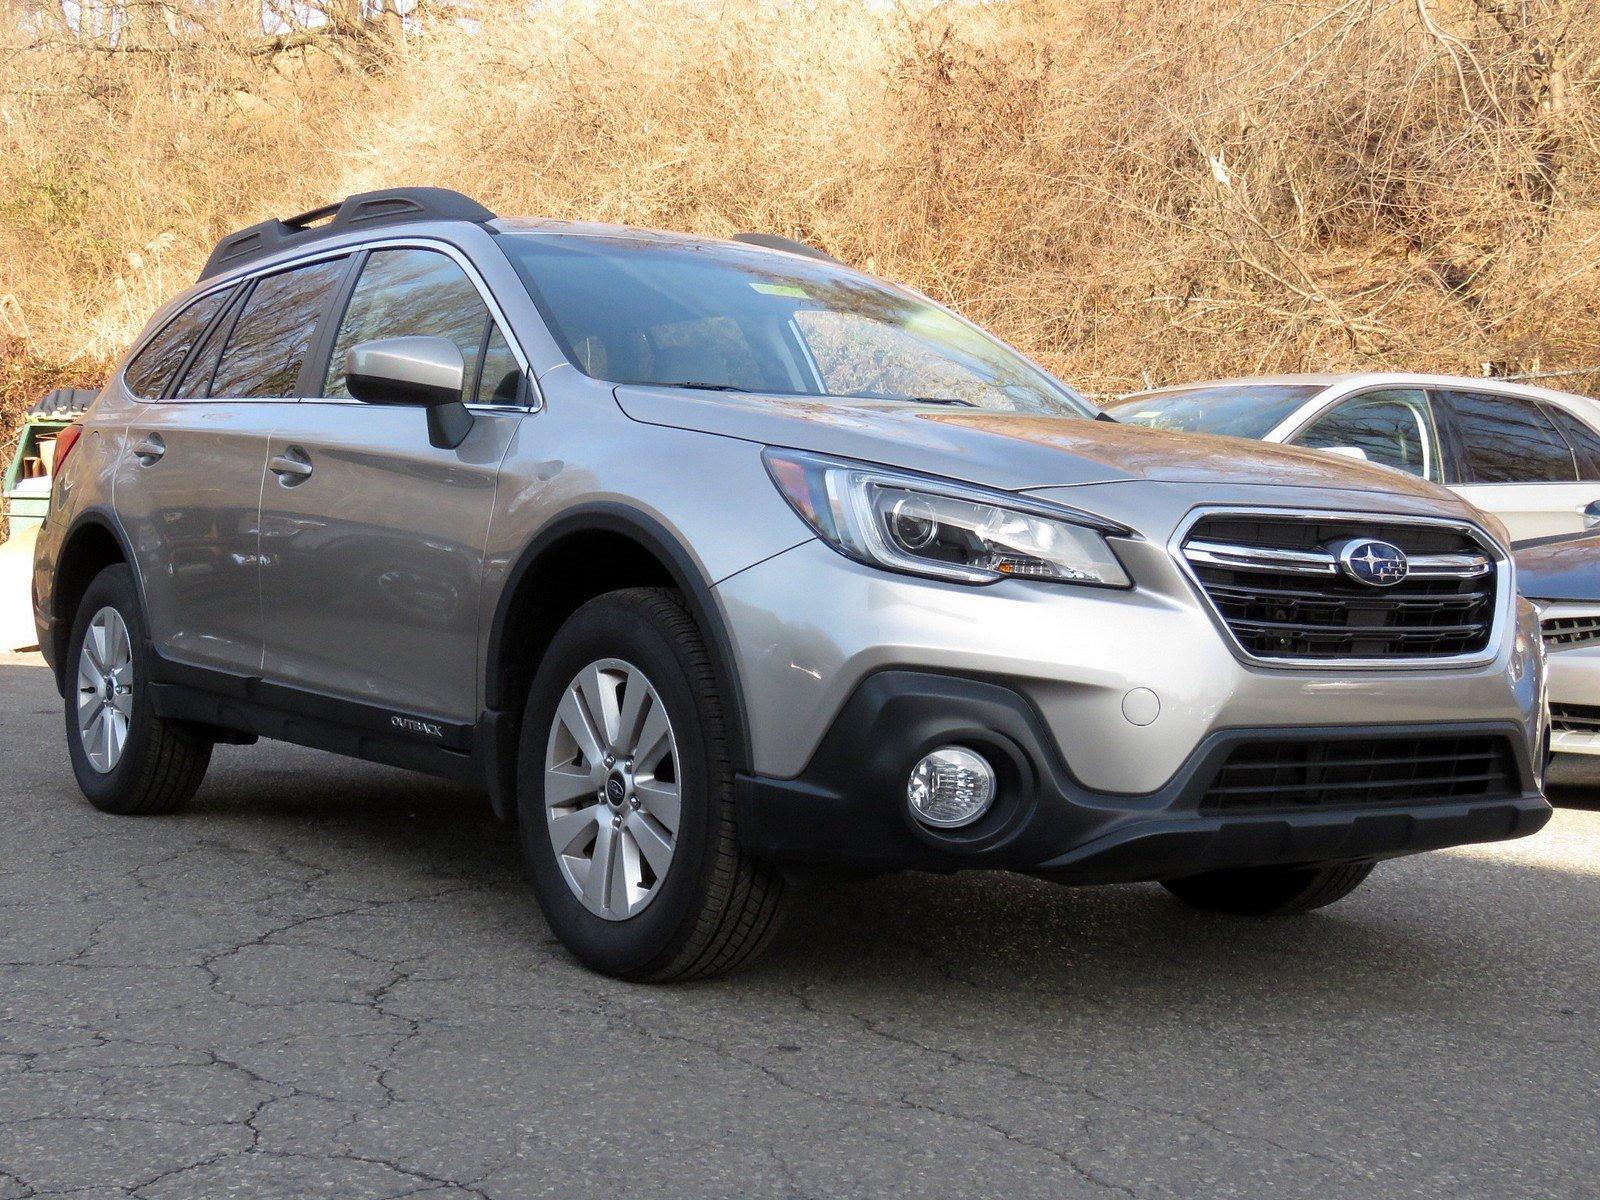 2018 Subaru Outback Premium SUV